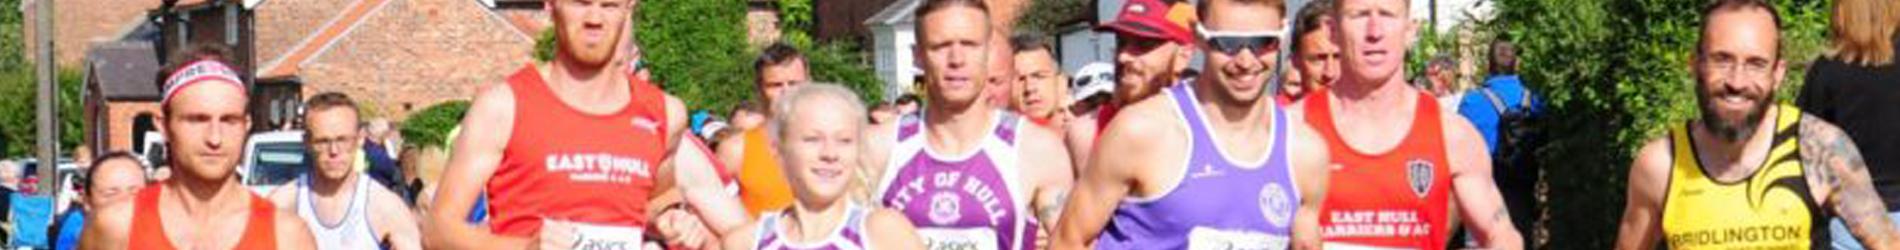 The Major Stone Half Marathon